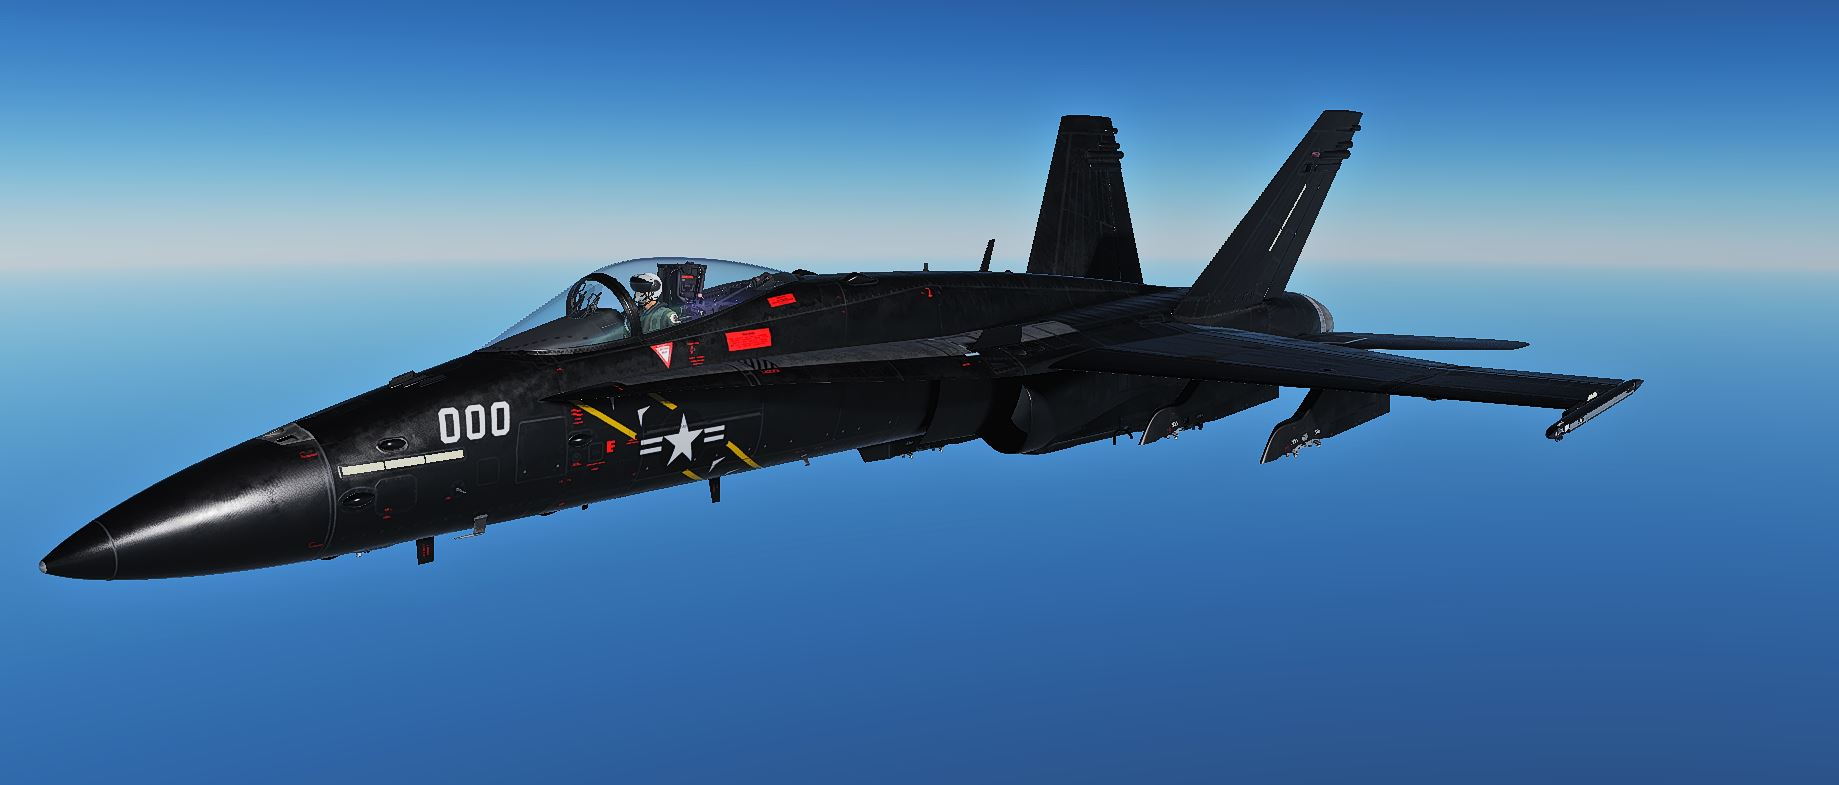 Black F18